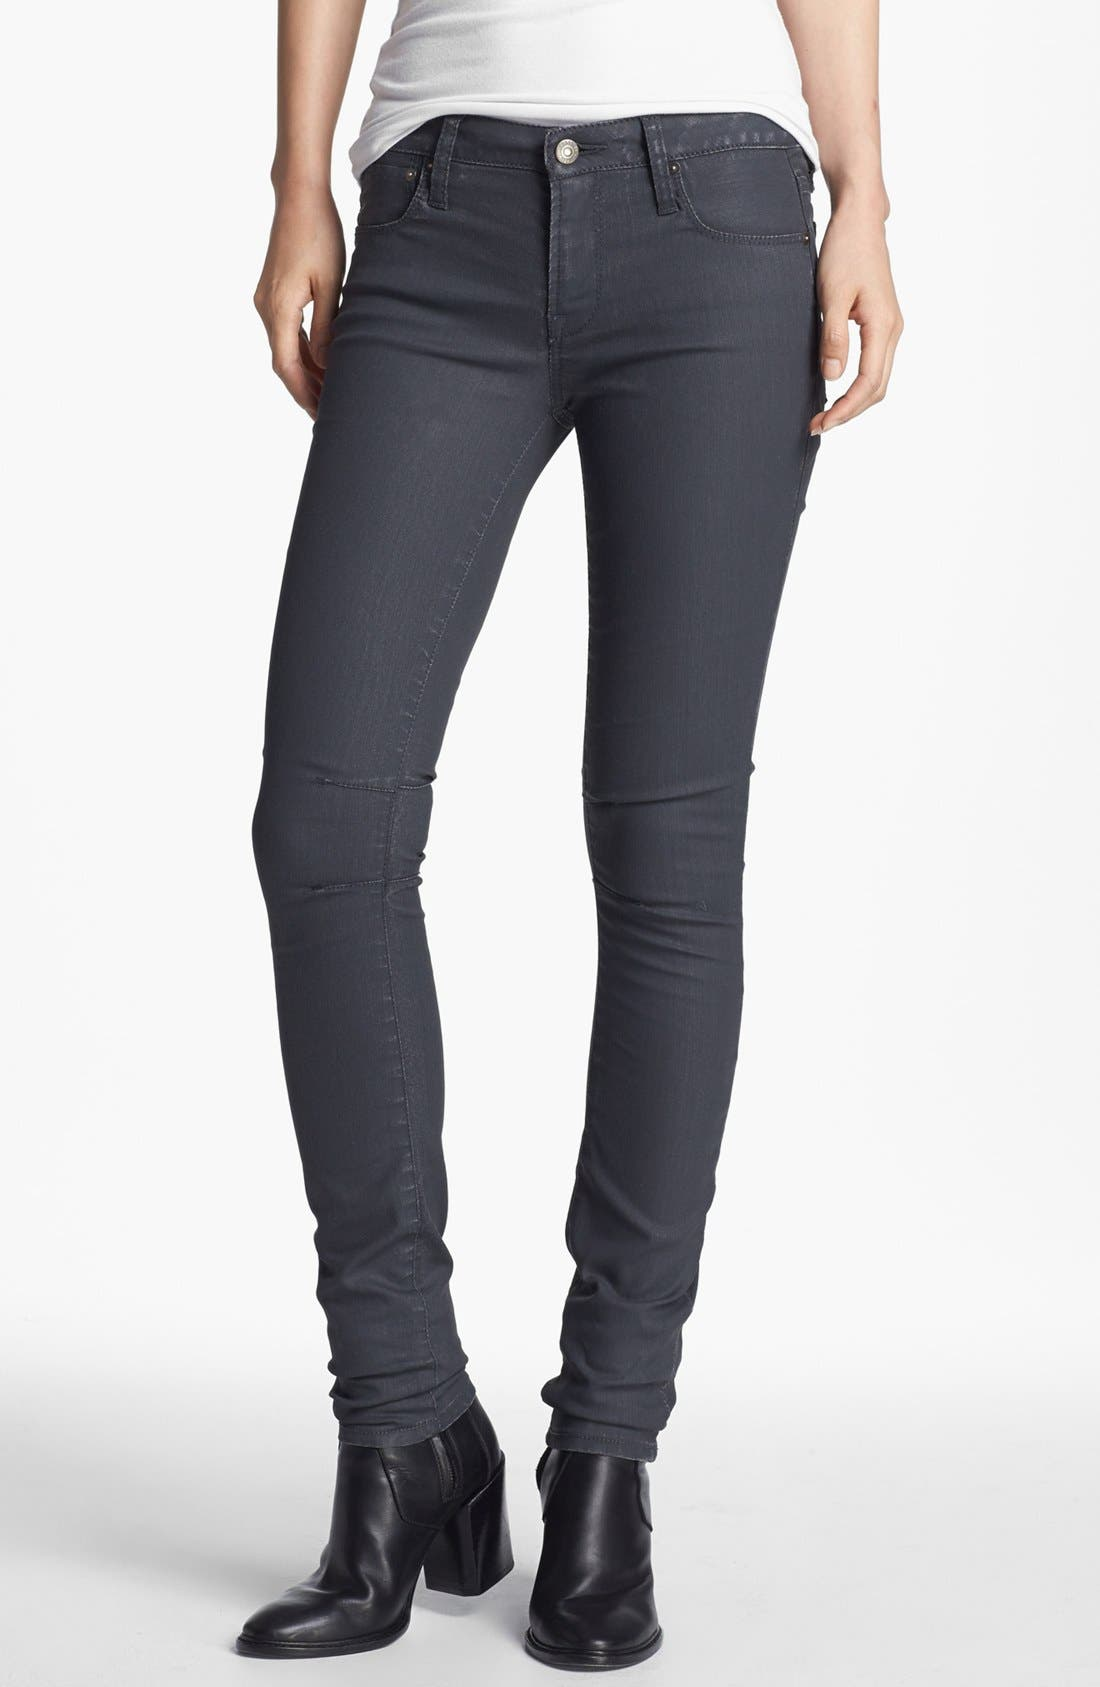 Main Image - HELMUT Helmut Lang 'Shale' Skinny Stretch Jeans